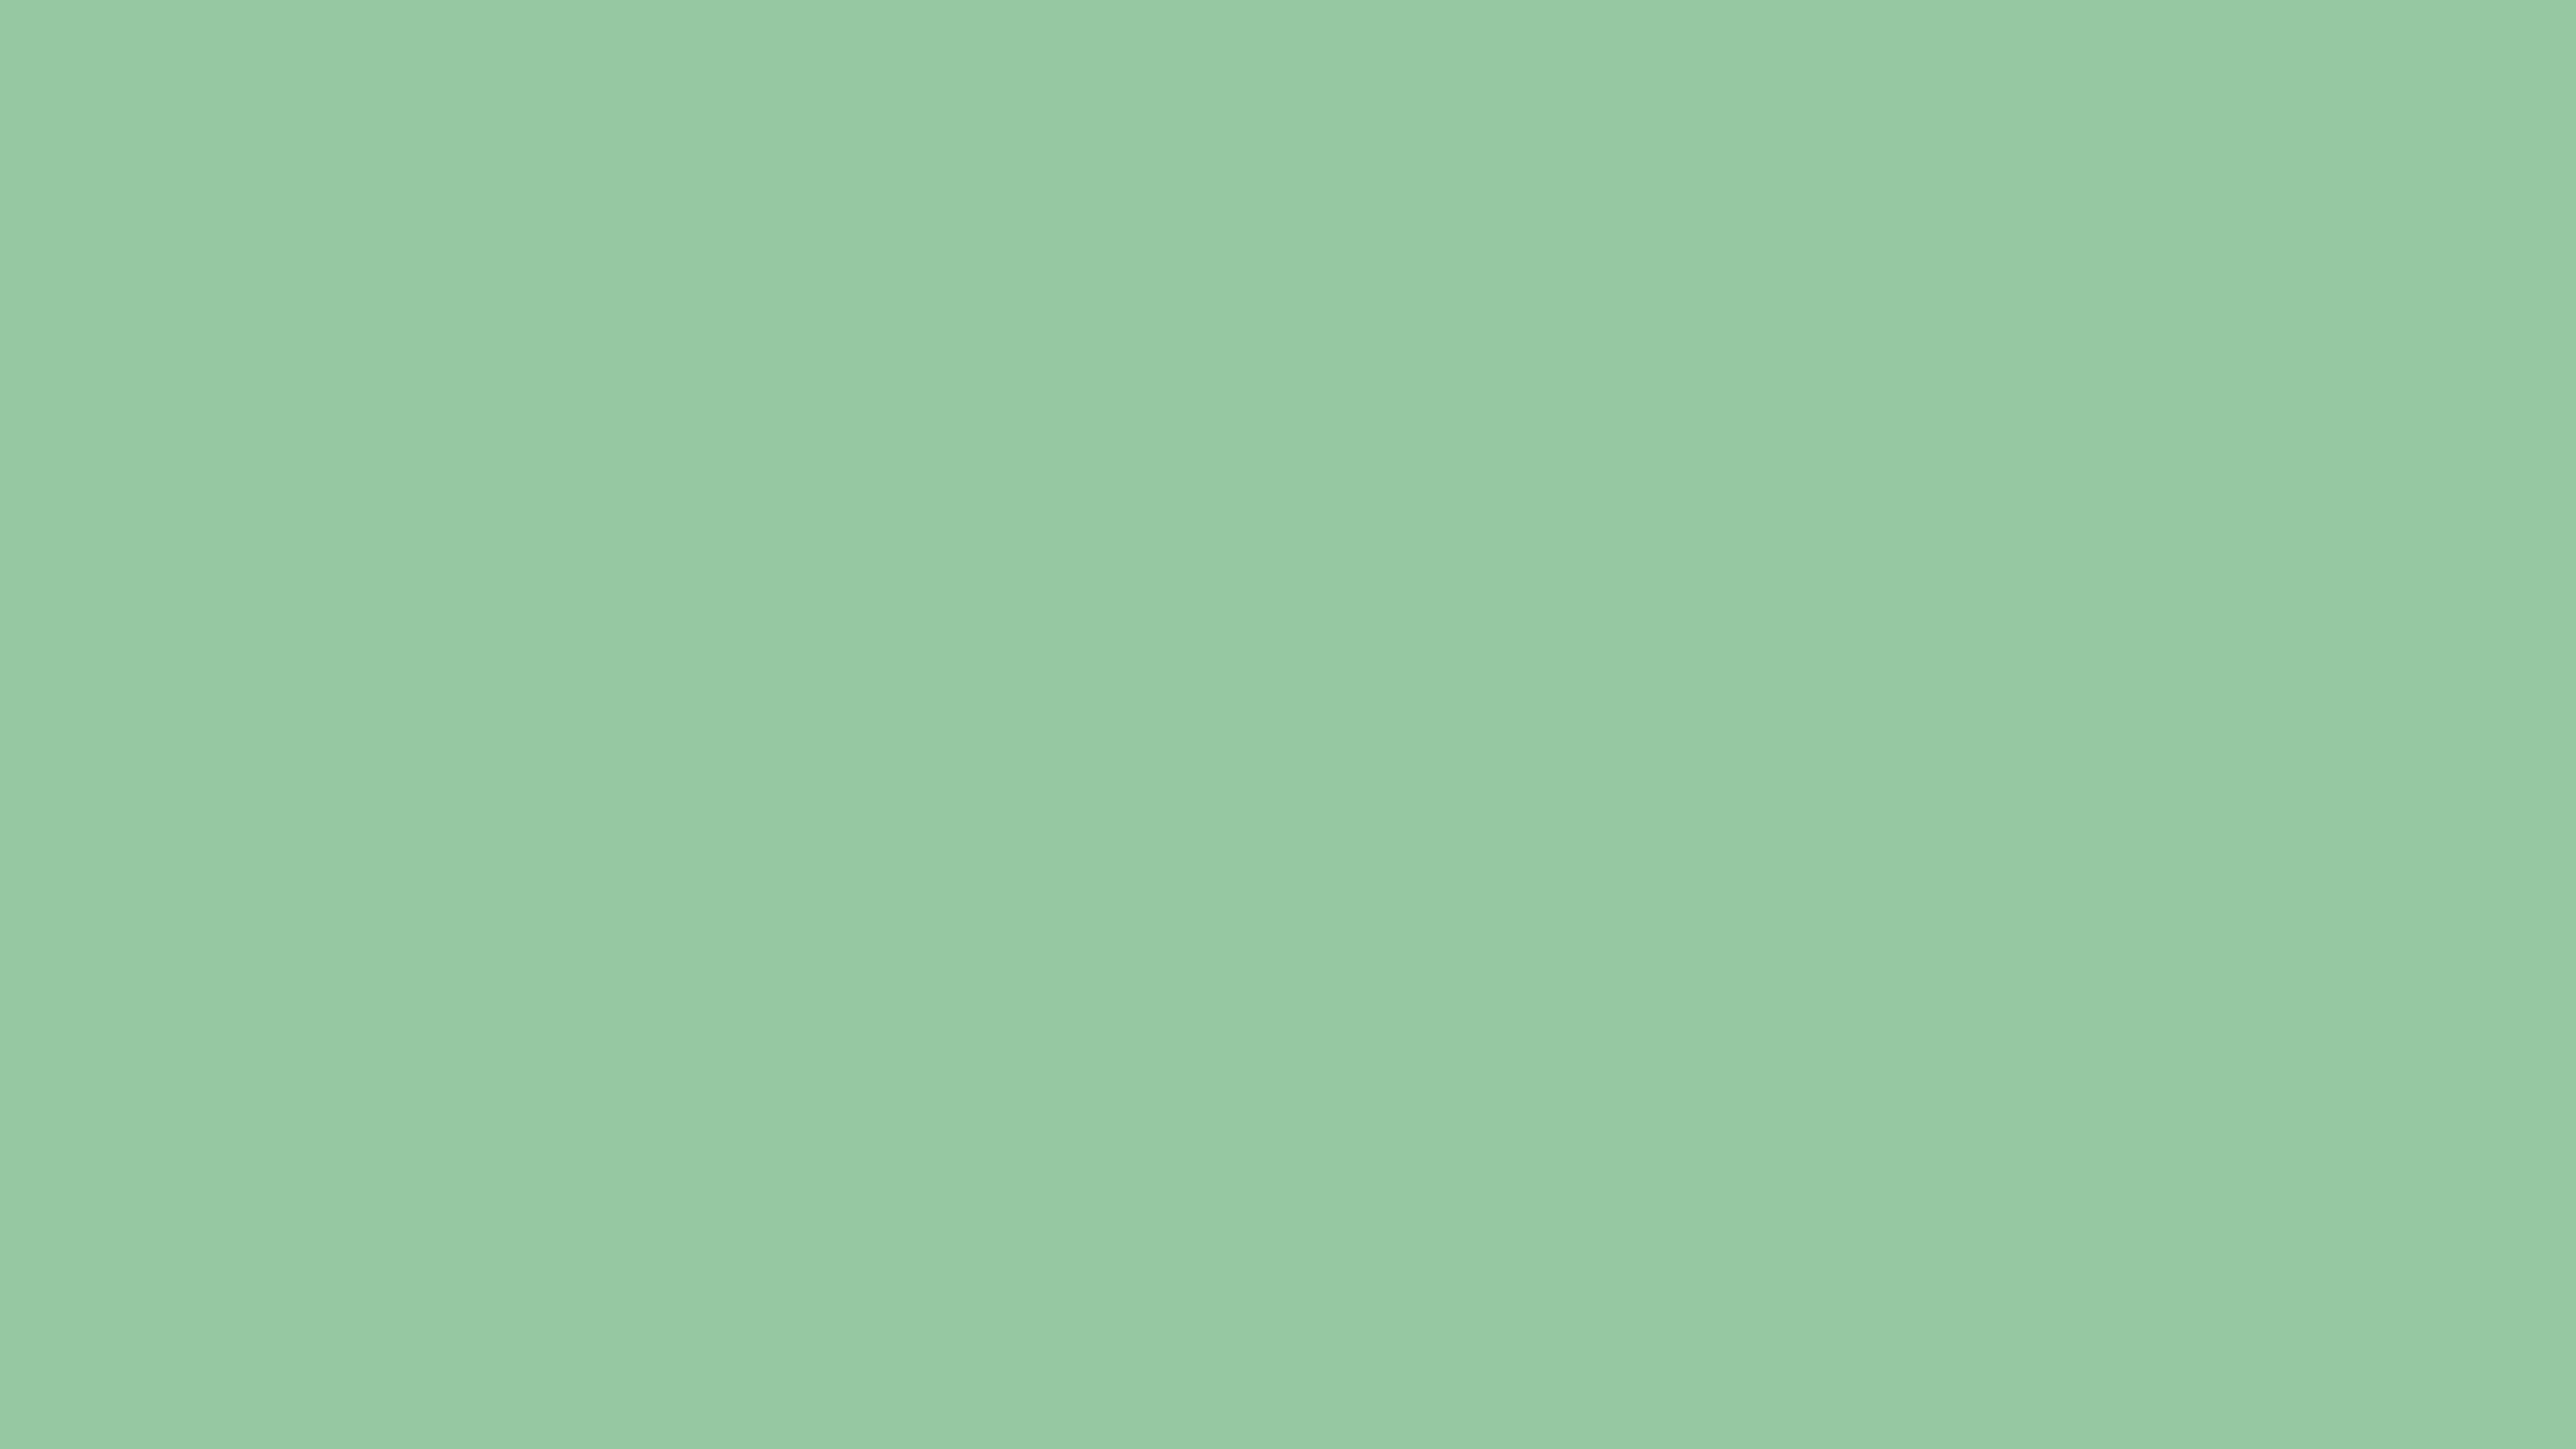 7680x4320 Eton Blue Solid Color Background